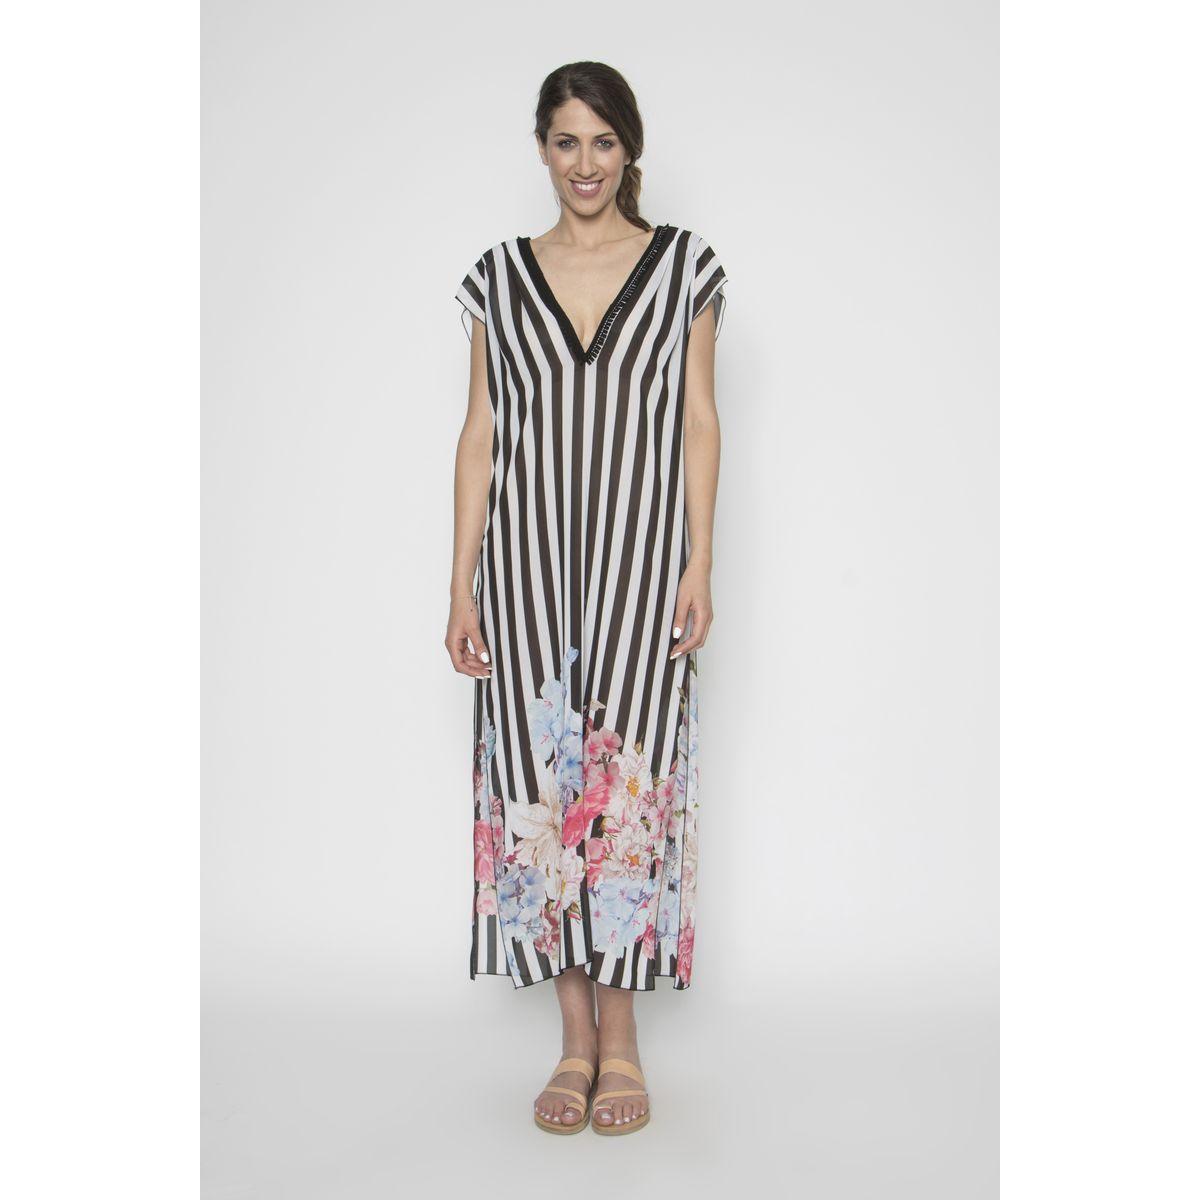 f482a545c5ee summer dressme.gr · Φόρεμα καλοκαιρινό με πον-πον. Καφτάνια για παραλία 2016